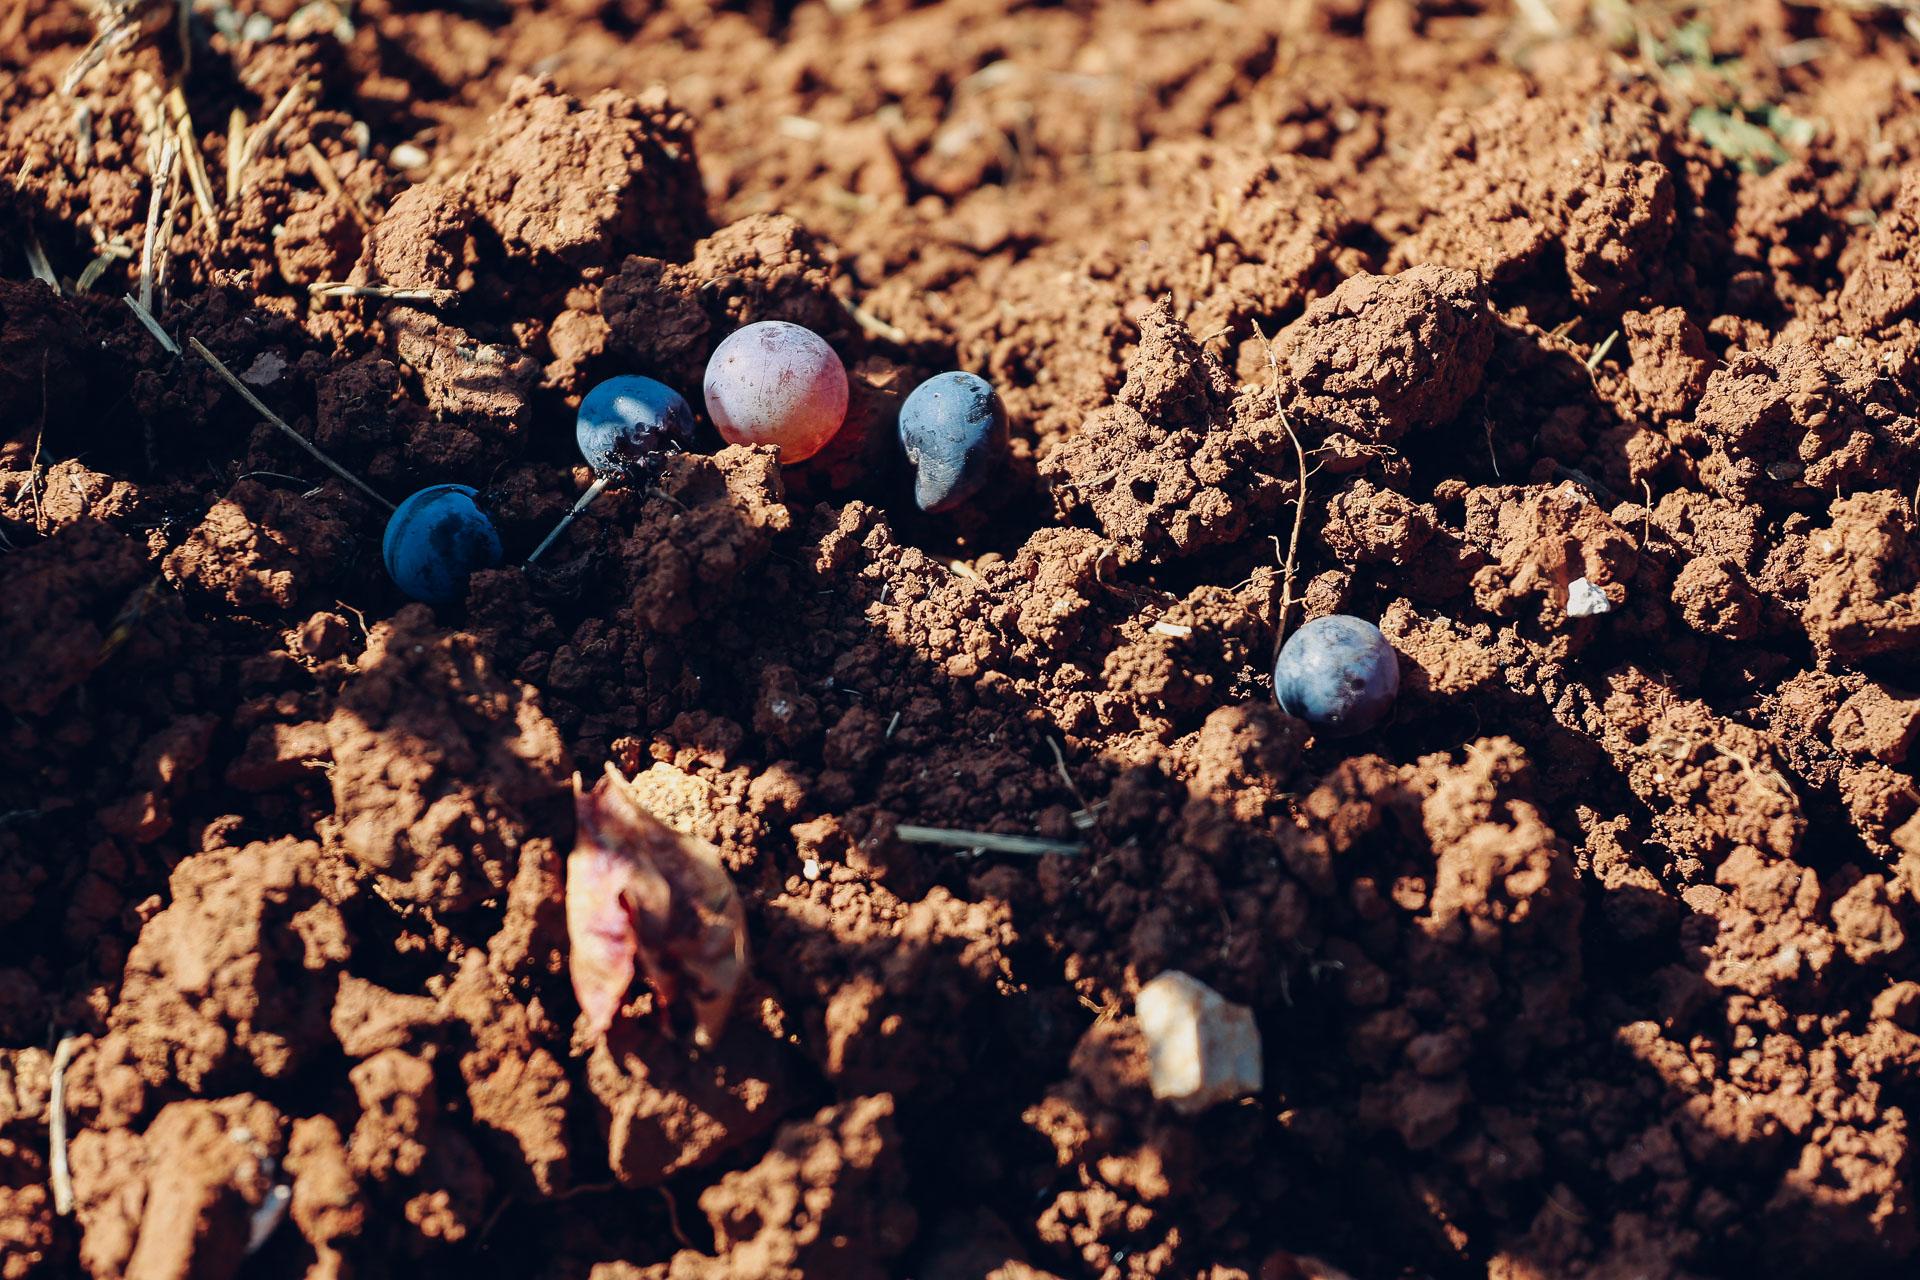 012-Sauro-maule-wineyards-organic-harvest-2016-_RUI7211_p_Lr_web_HD